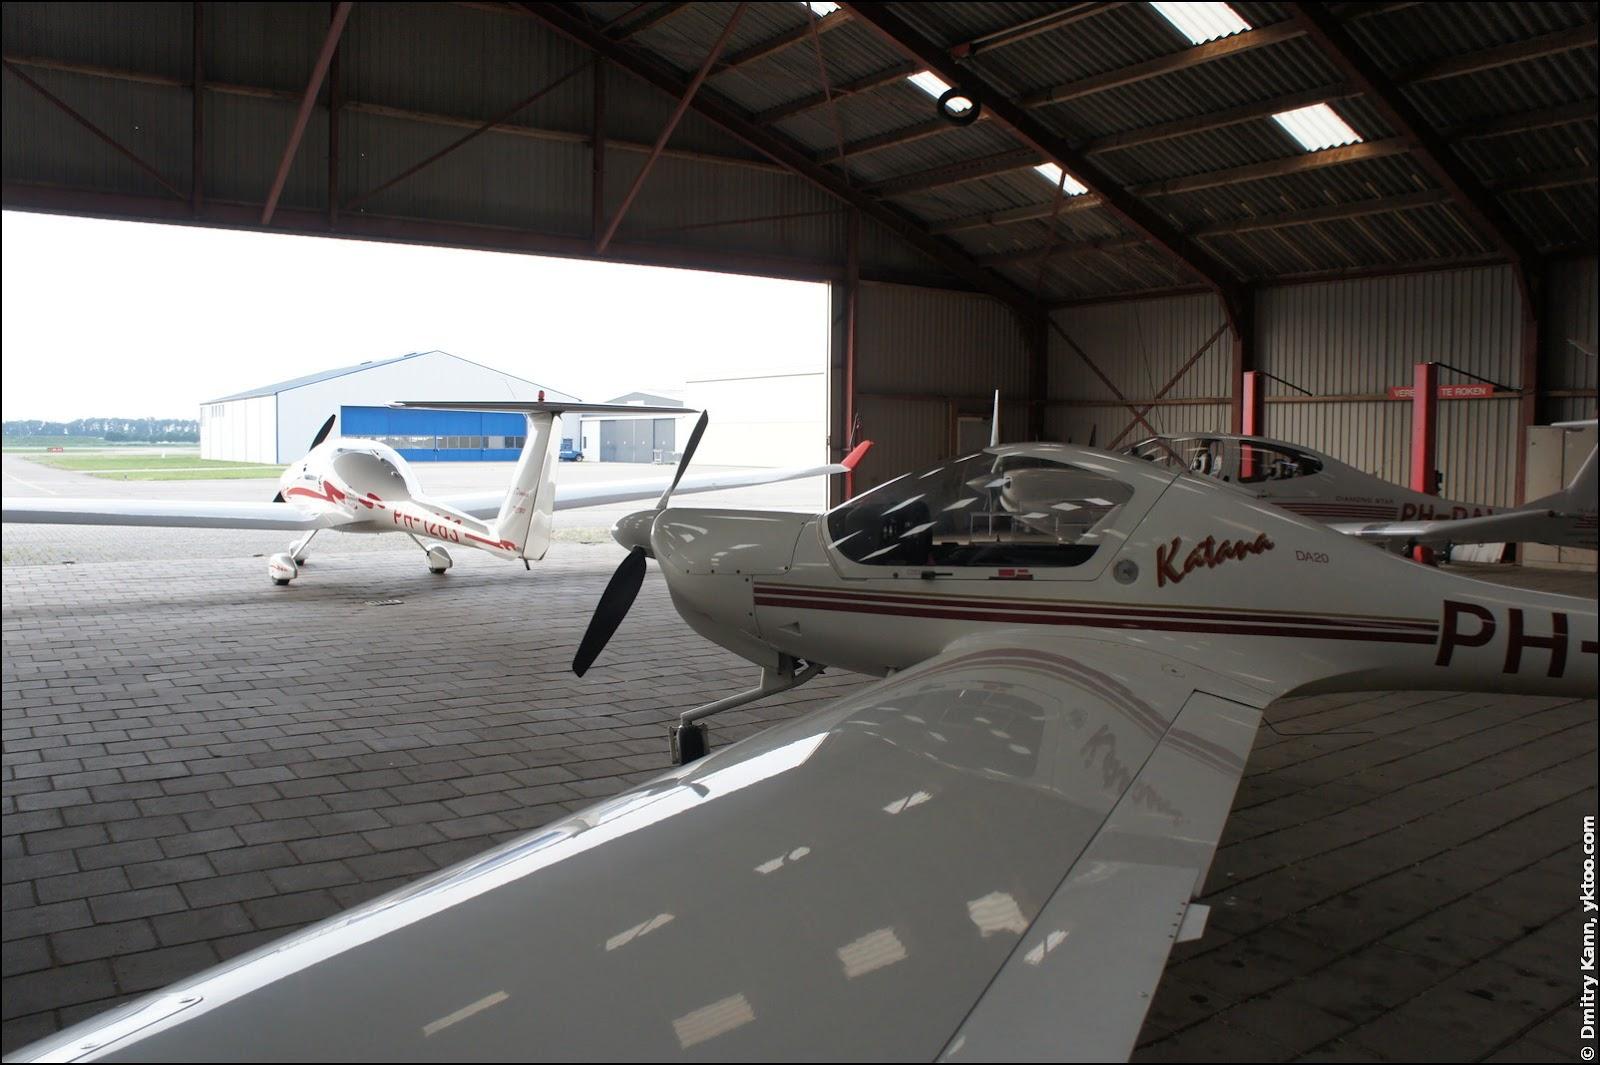 Replacing the aircrafts.